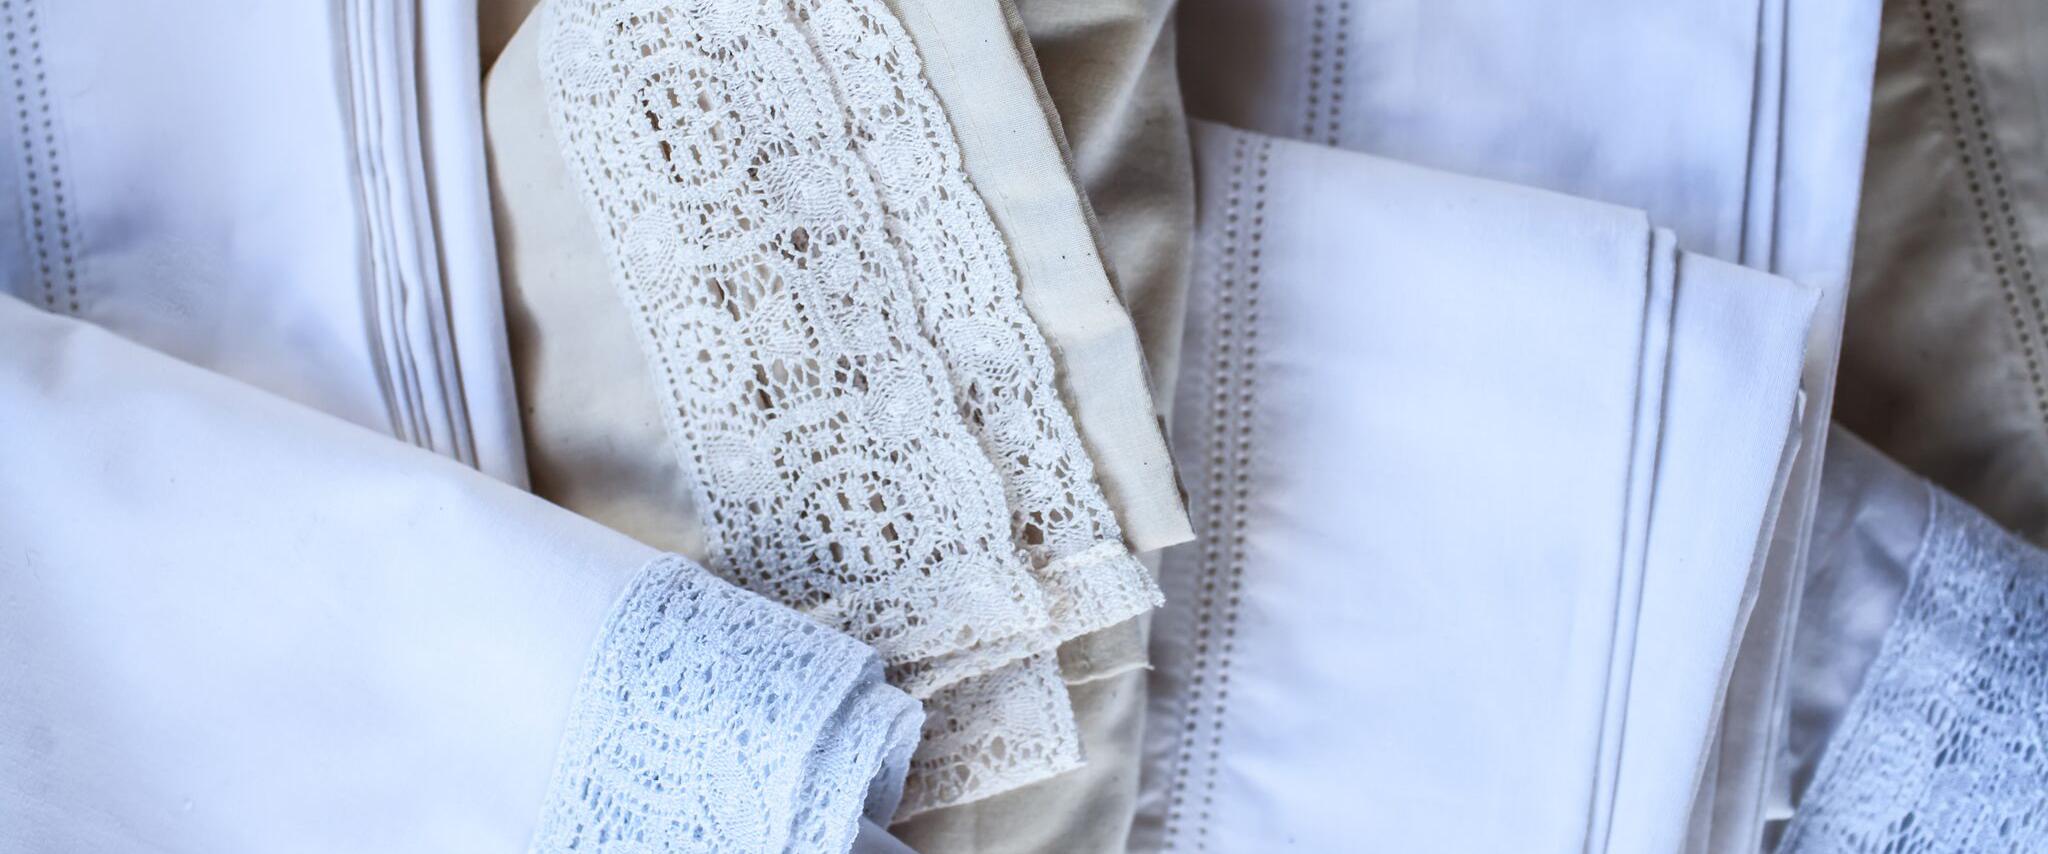 Redland Cotton Sheets Flat 960